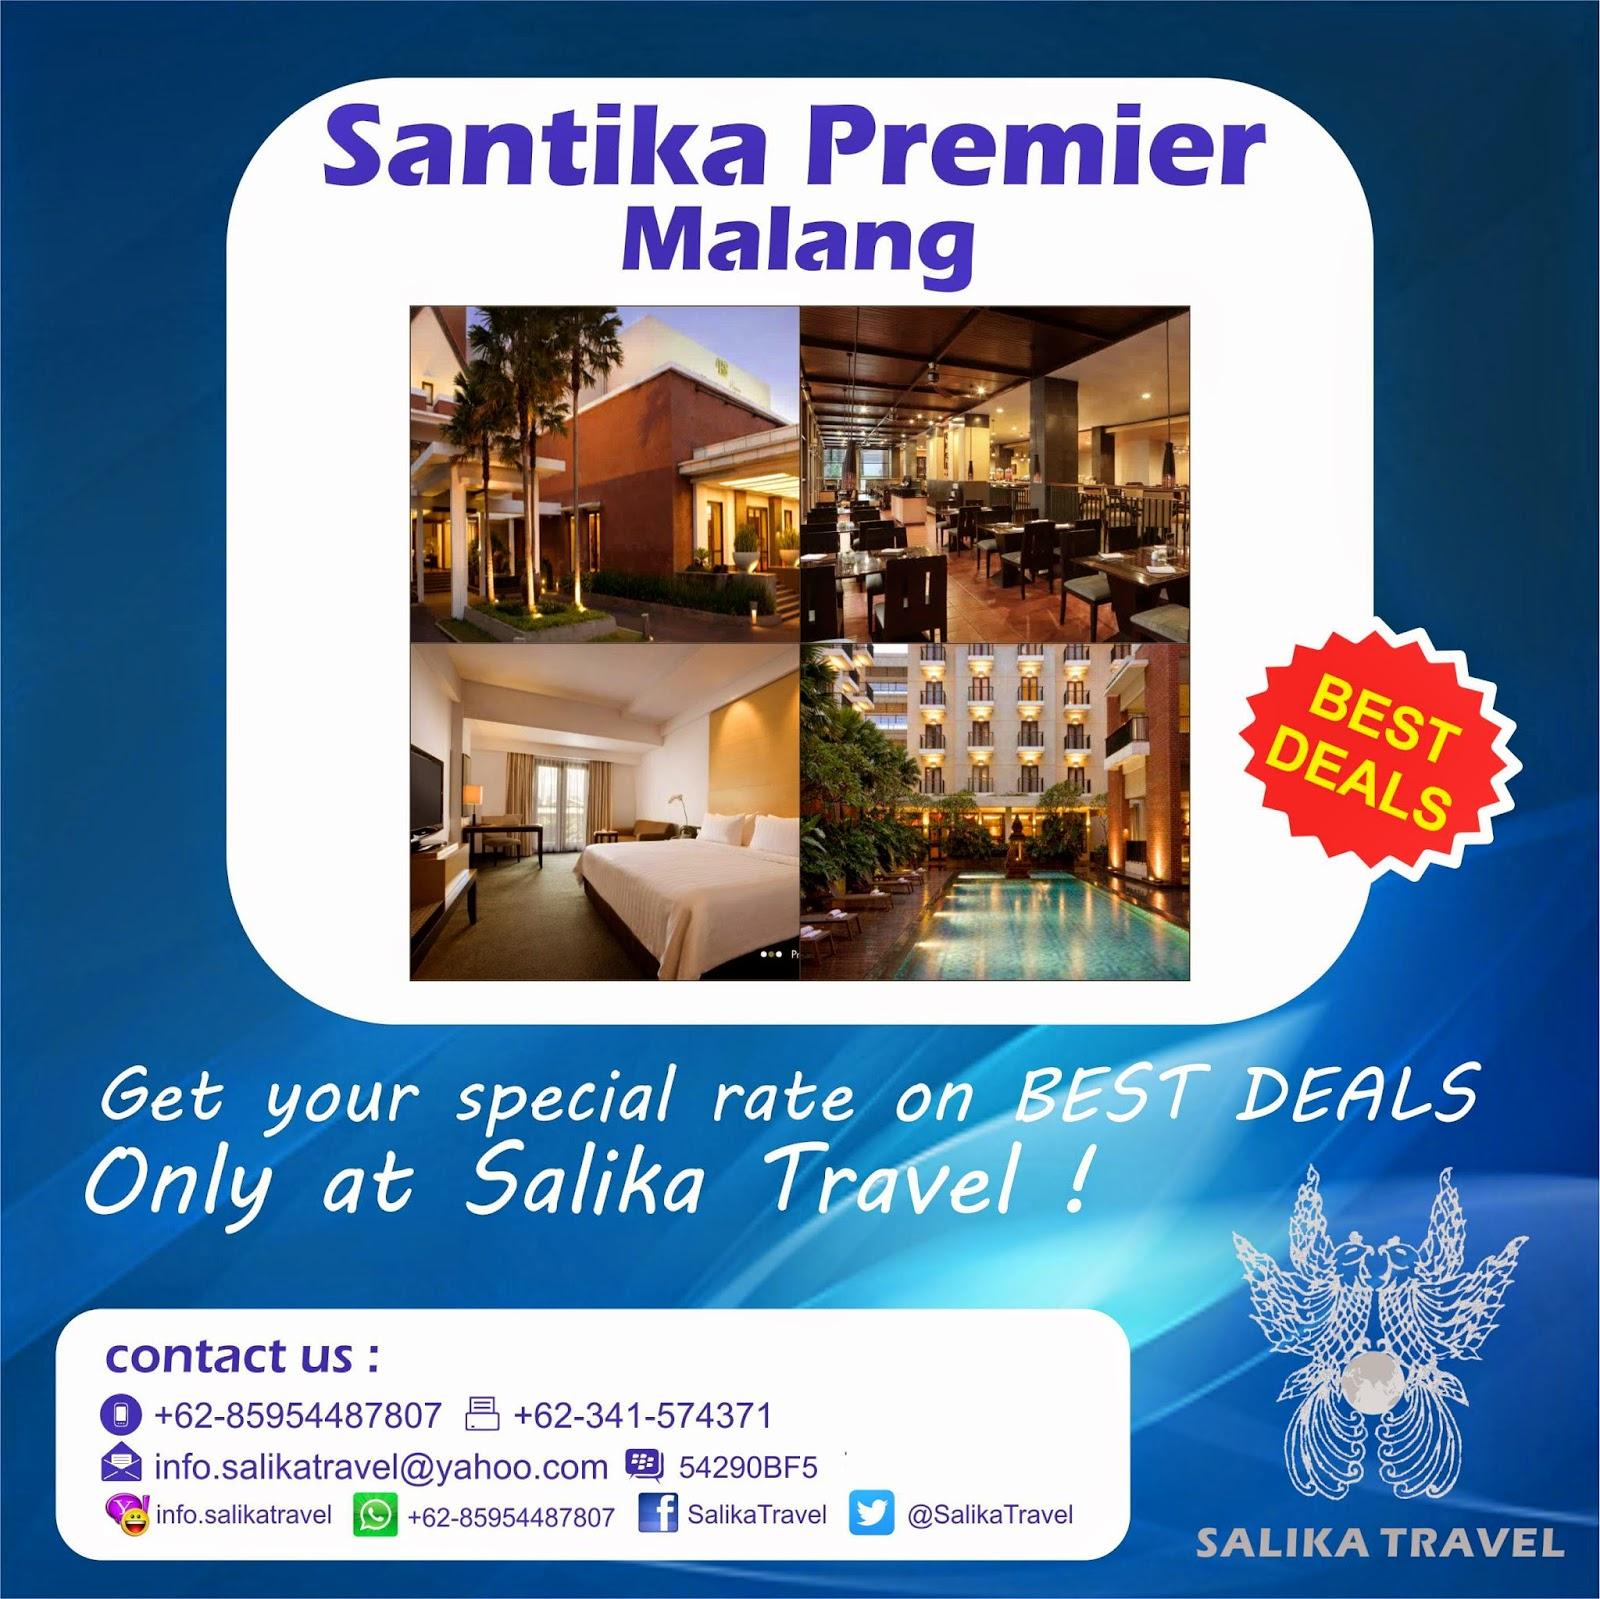 Santika Premier Malang Hotel - Salika Travel